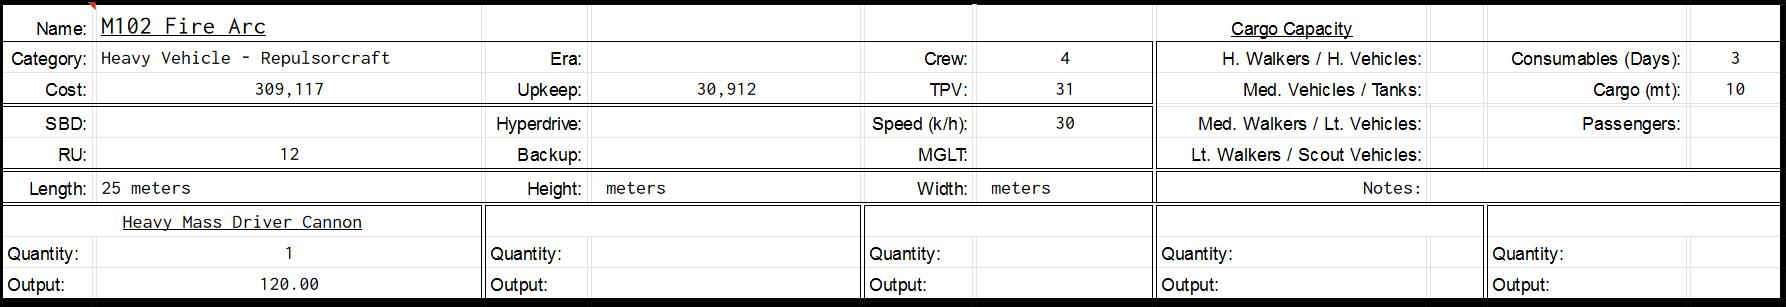 [Image: M102.png]